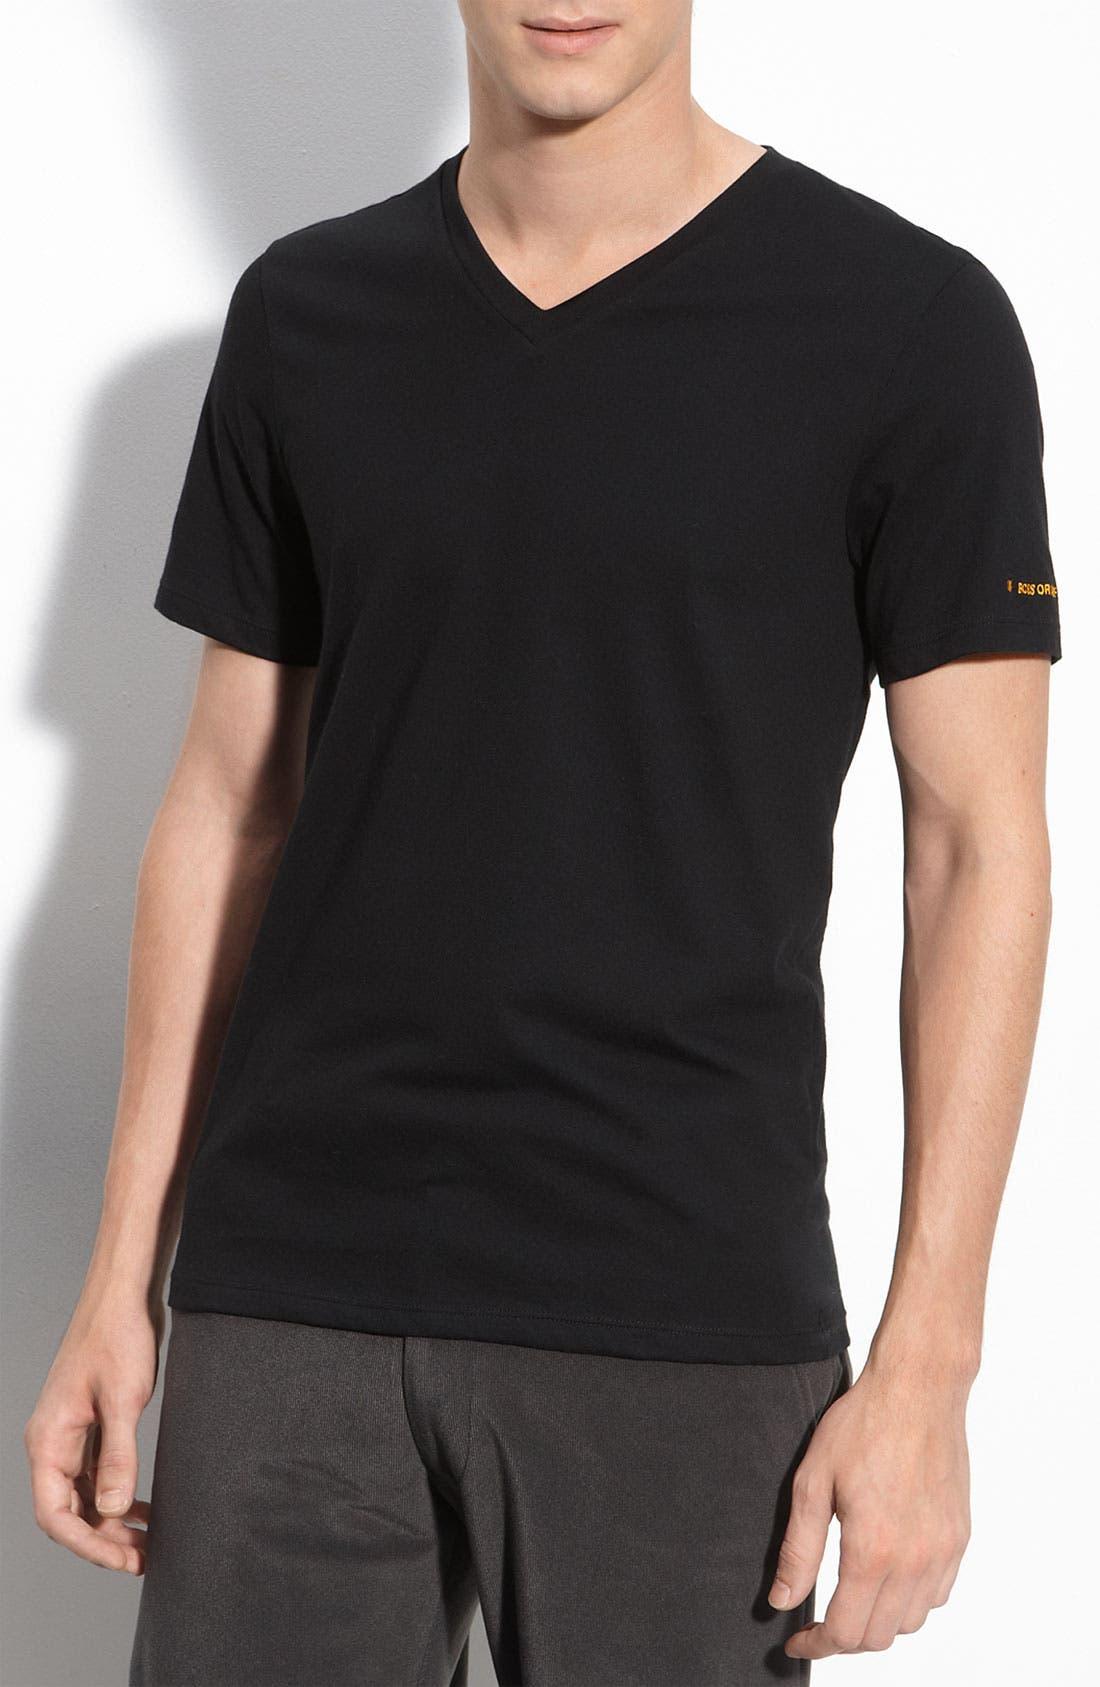 Main Image - BOSS Orange 'Innovation' V-Neck T-Shirt